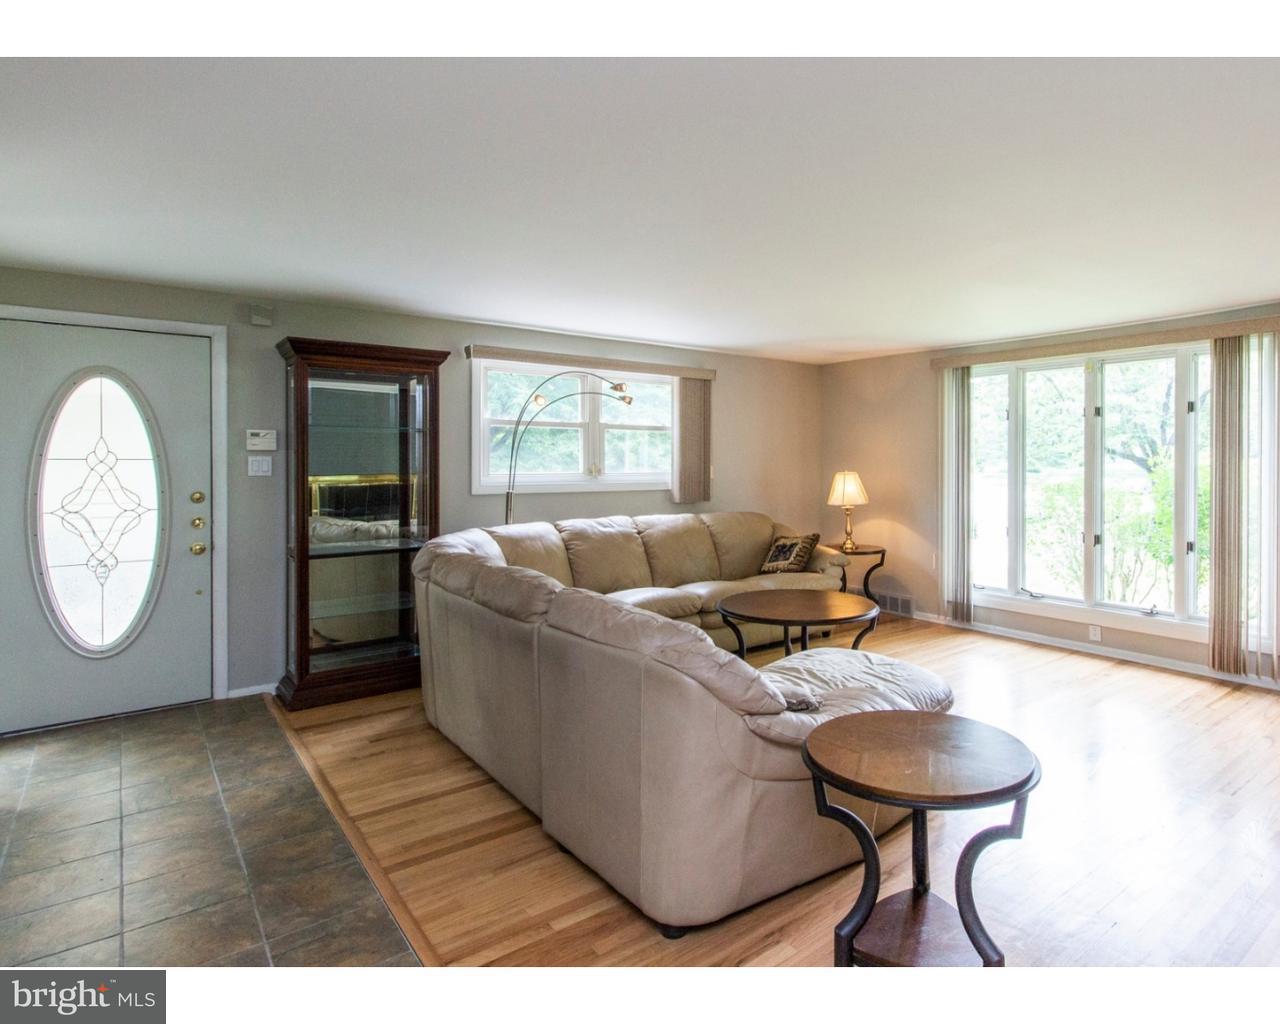 309 ELLIS RD, HAVERTOWN - Listed at $699,000, HAVERTOWN